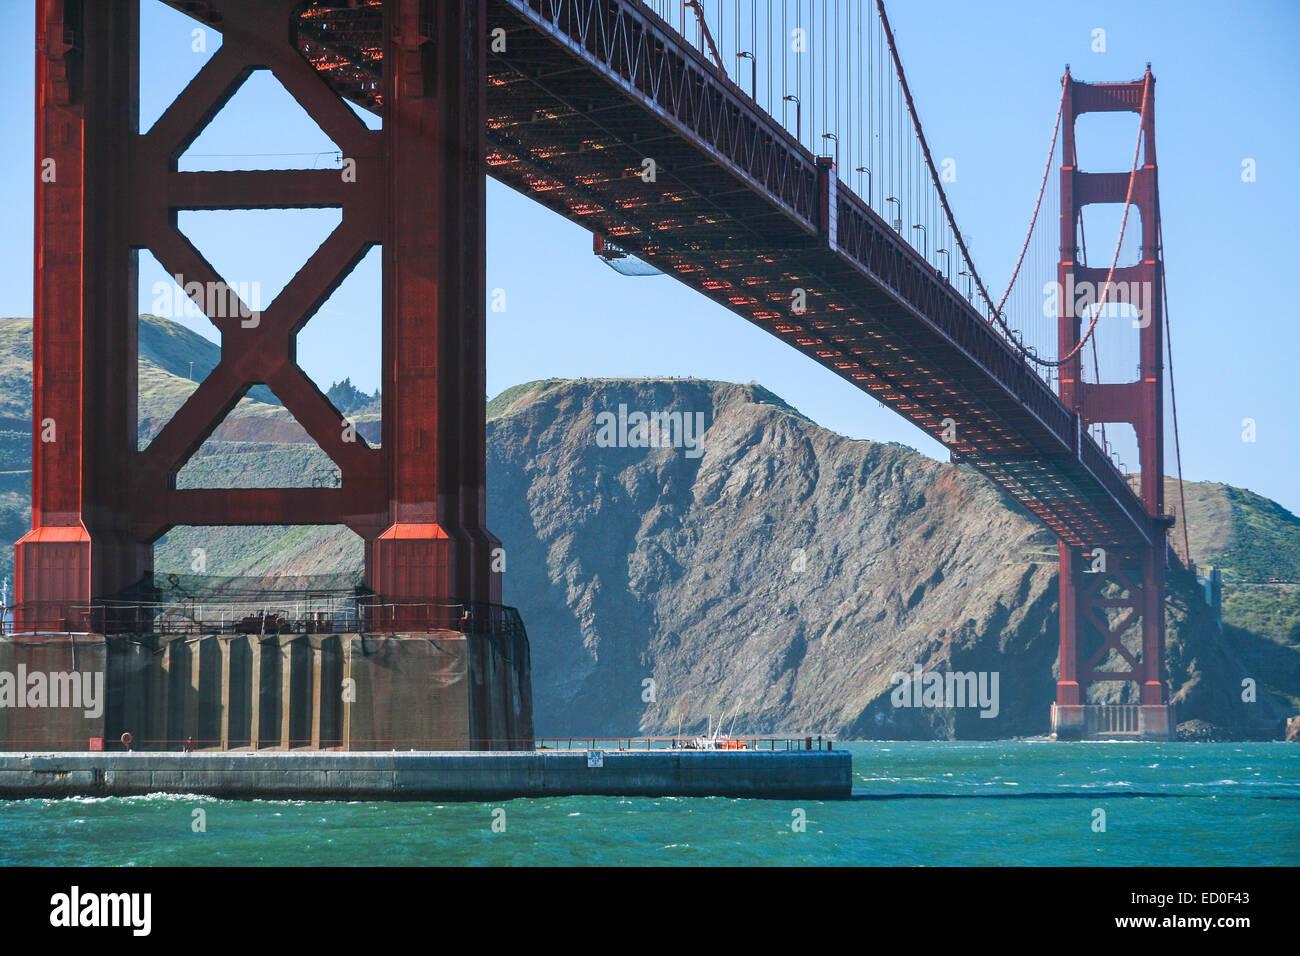 USA, Kalifornien, San Francisco, niedrigen Winkel Blick auf Golden Gate Bridge Stockbild